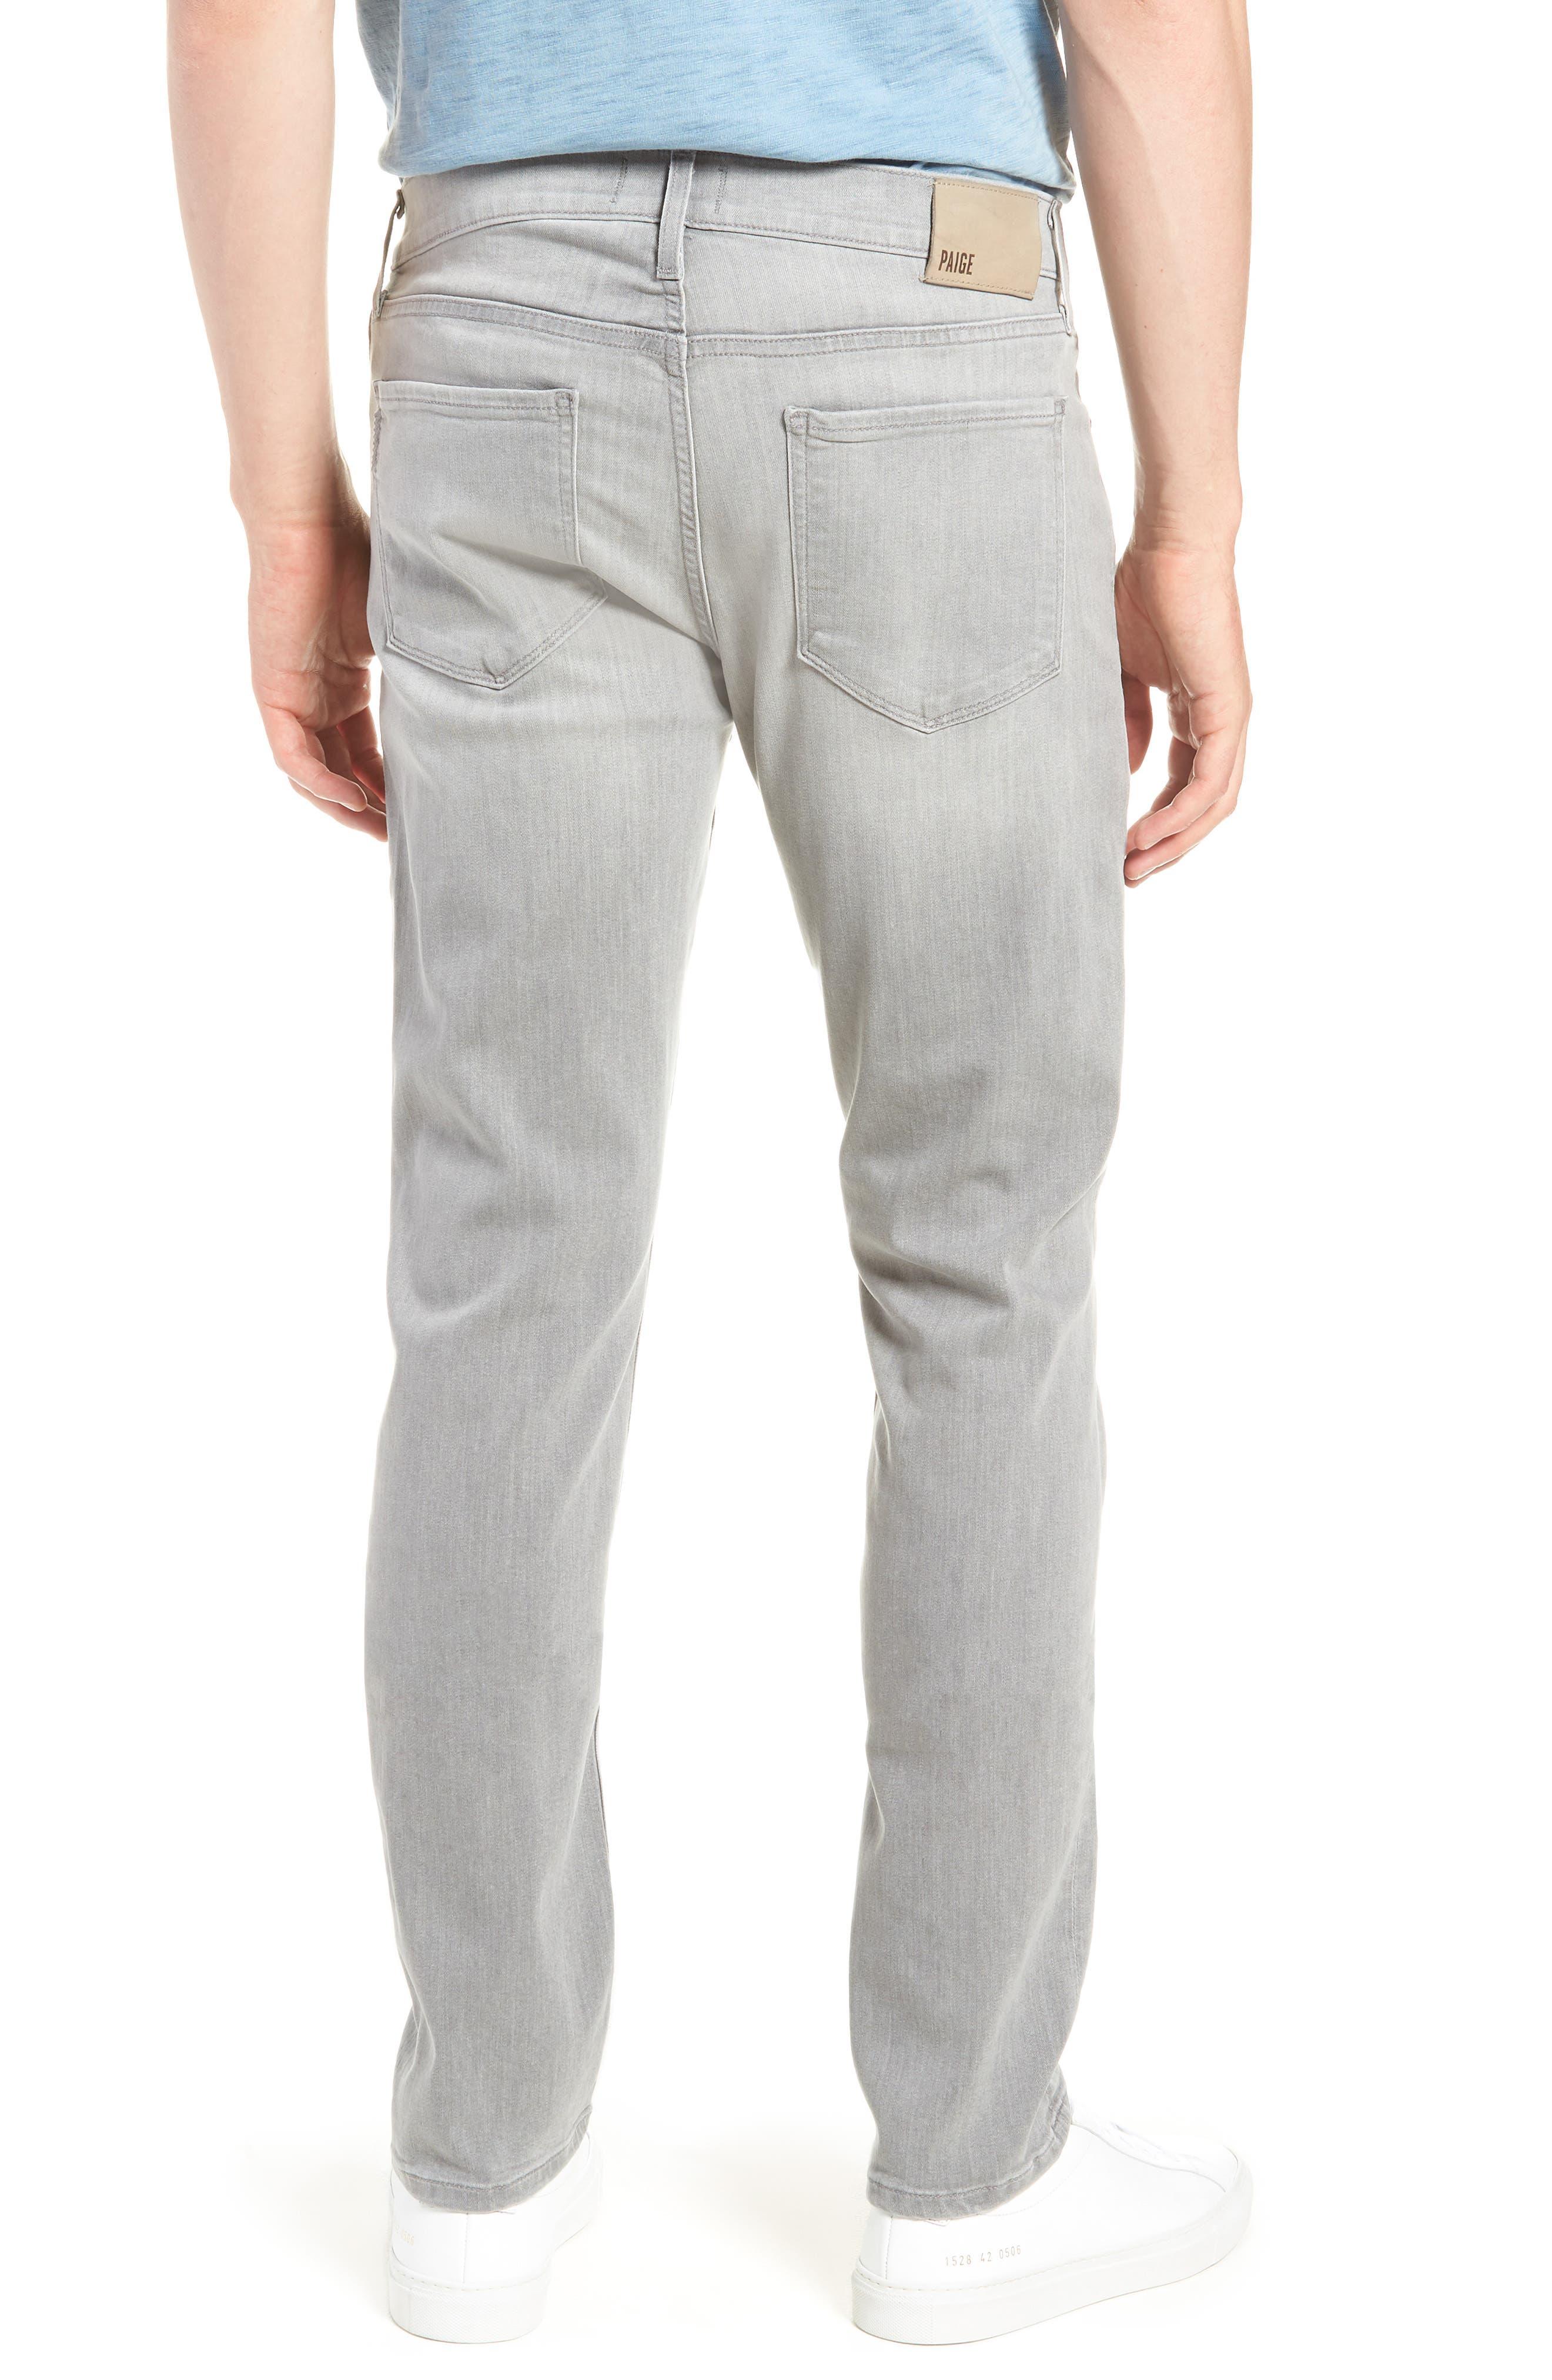 Transcend - Lennox Slim Fit Jeans,                             Alternate thumbnail 2, color,                             Mannor